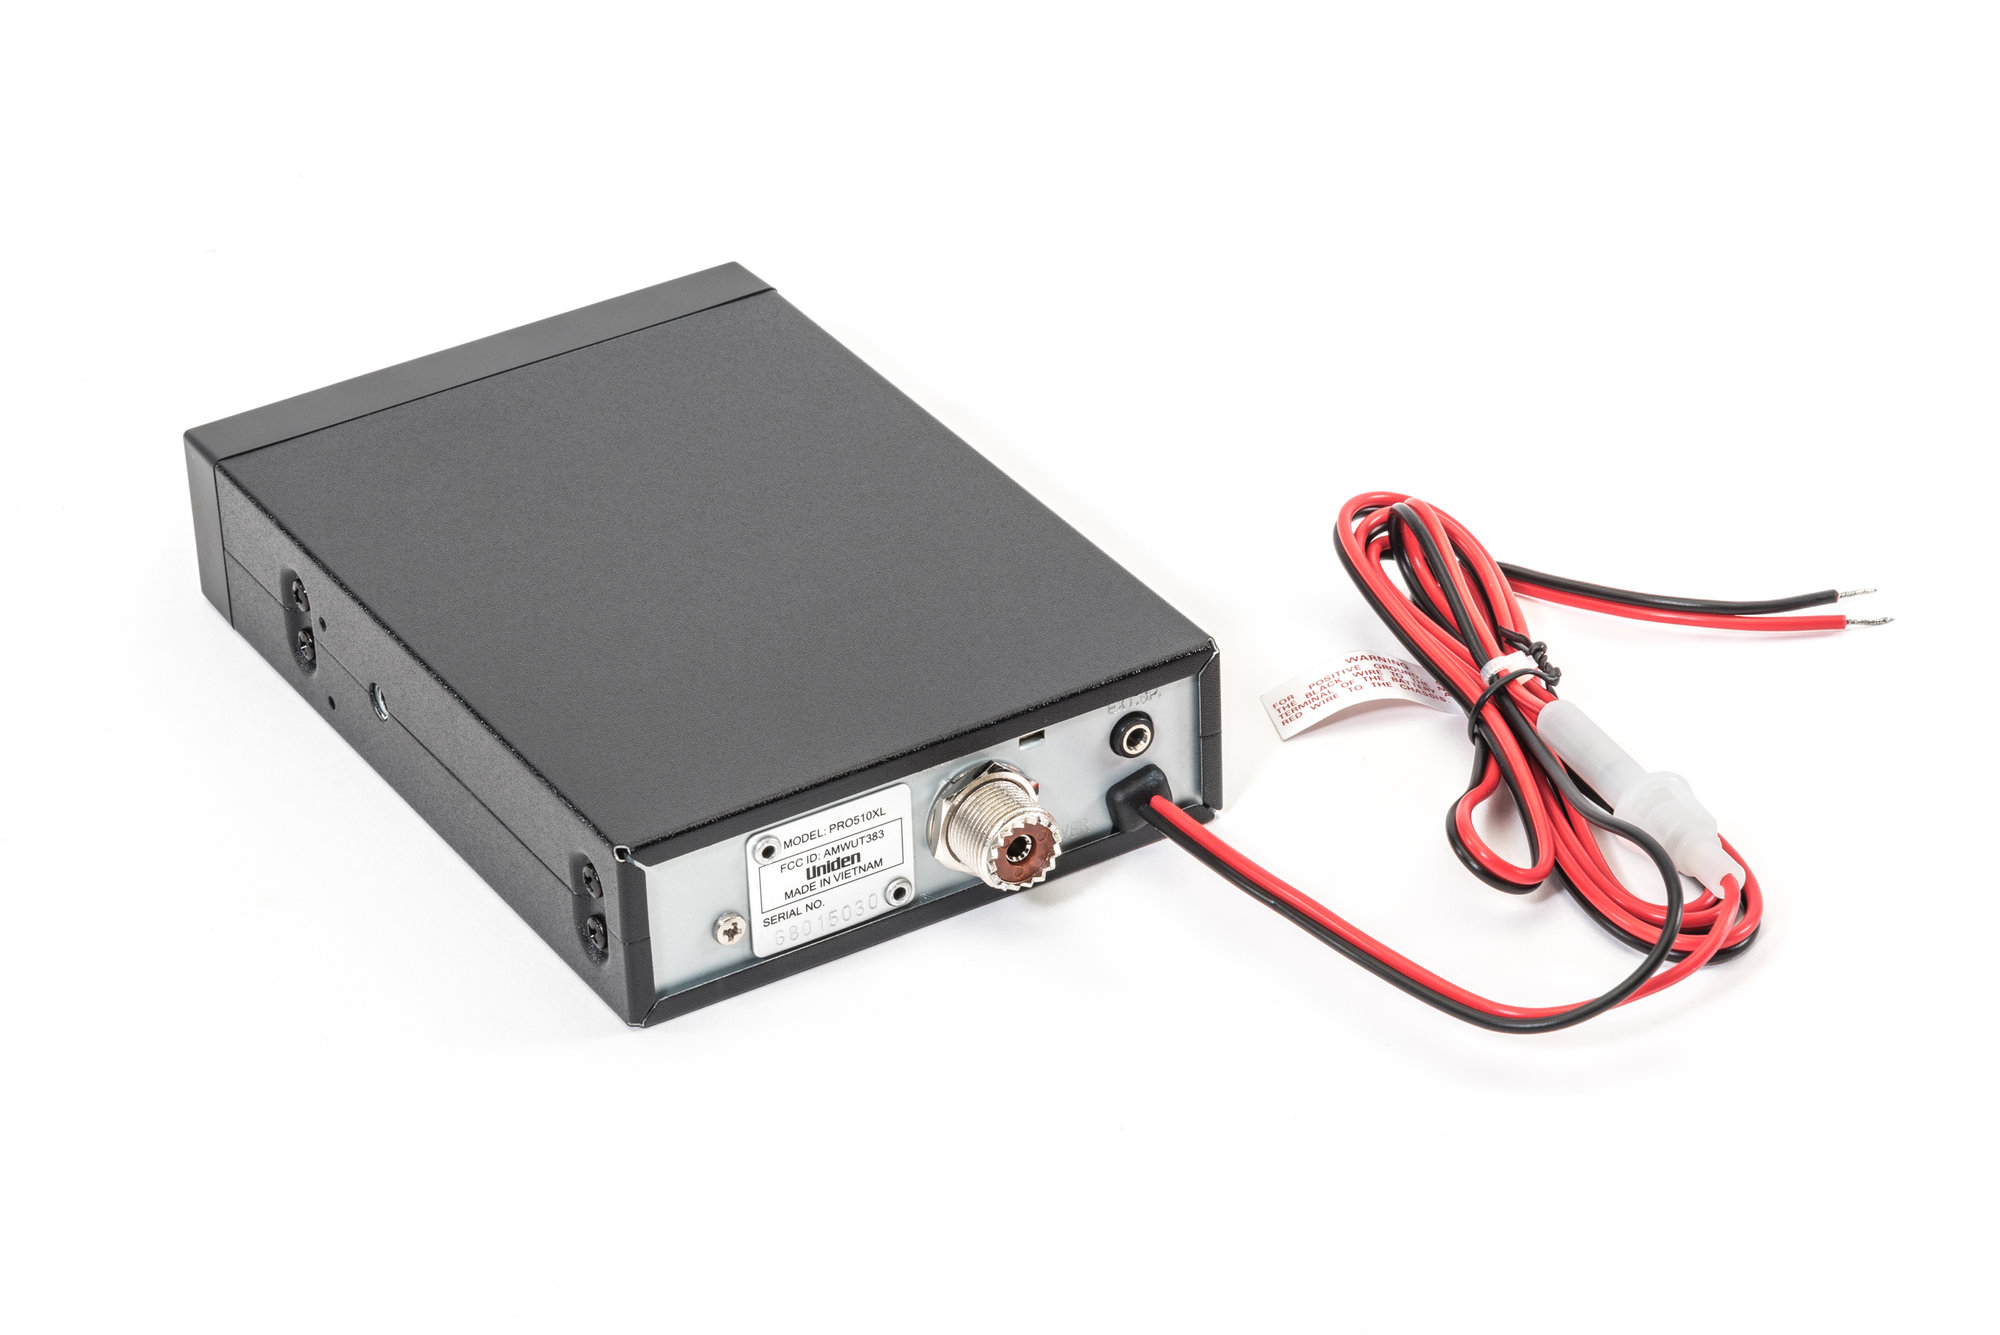 Garmin Radar Wiring Diagram 27 Images Uniden Nmea Cable Cfe Pro 510 Cb Radio 02 96080 90resize